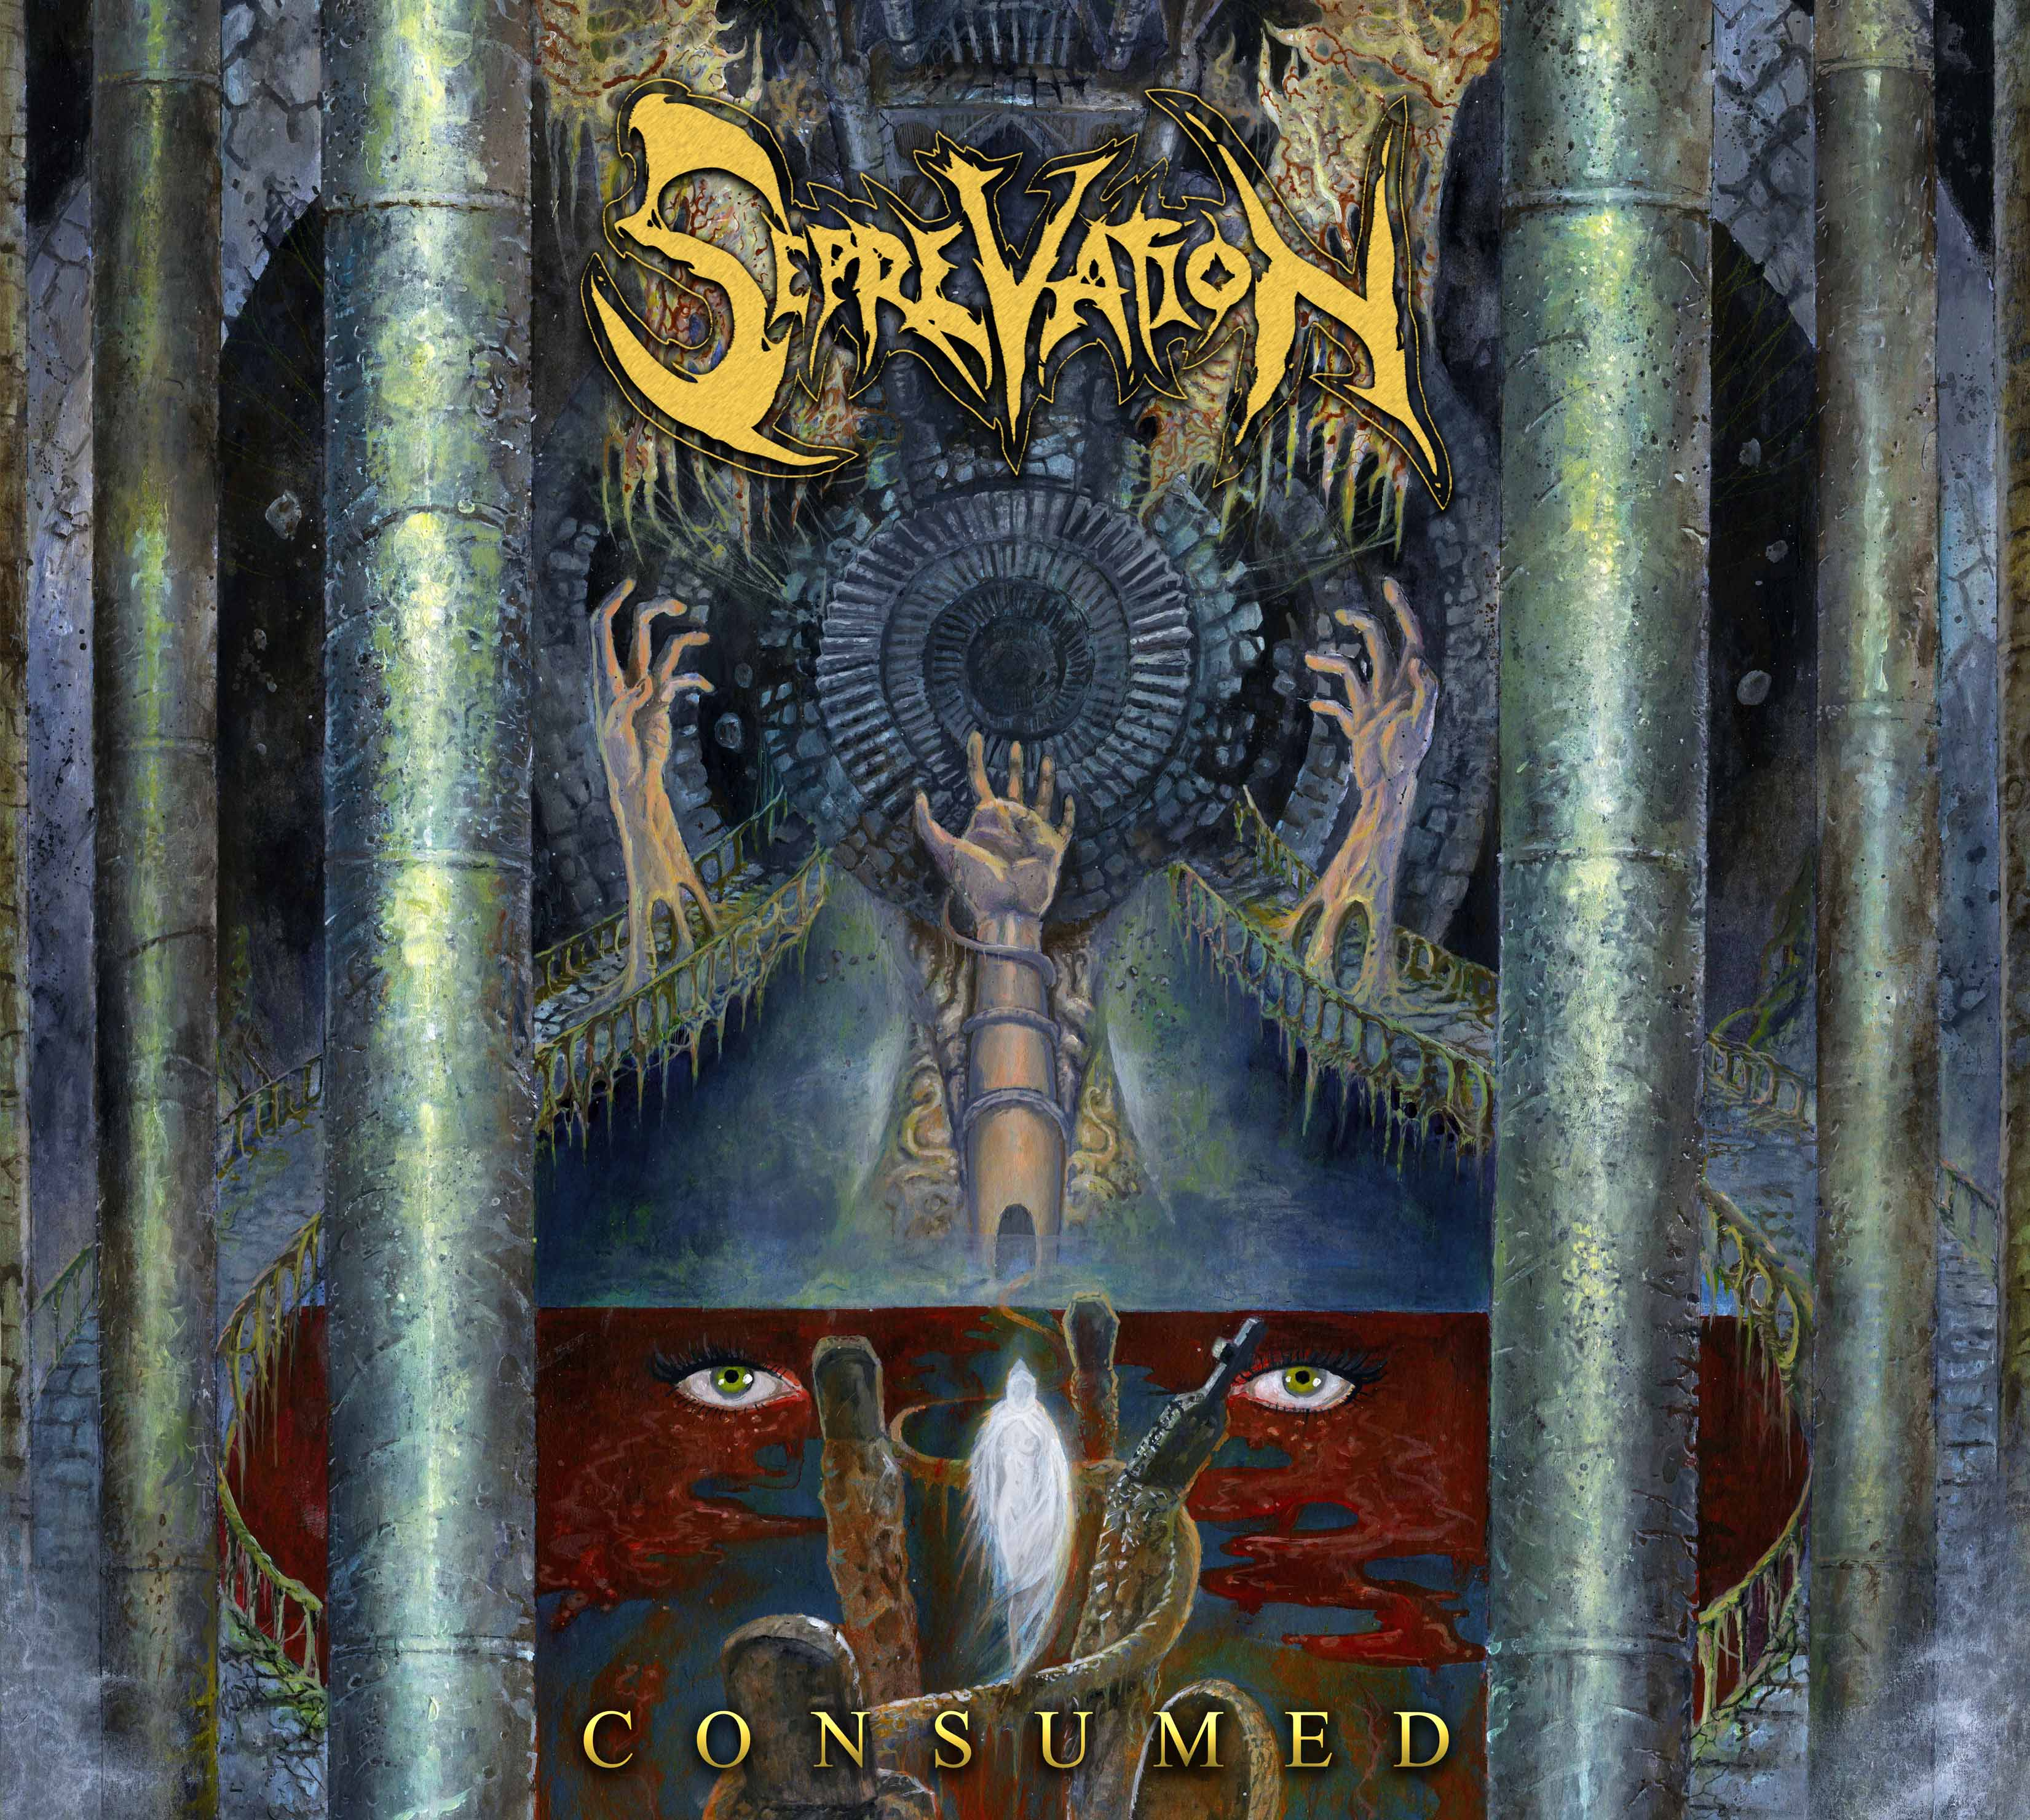 Seprevation – Consumed